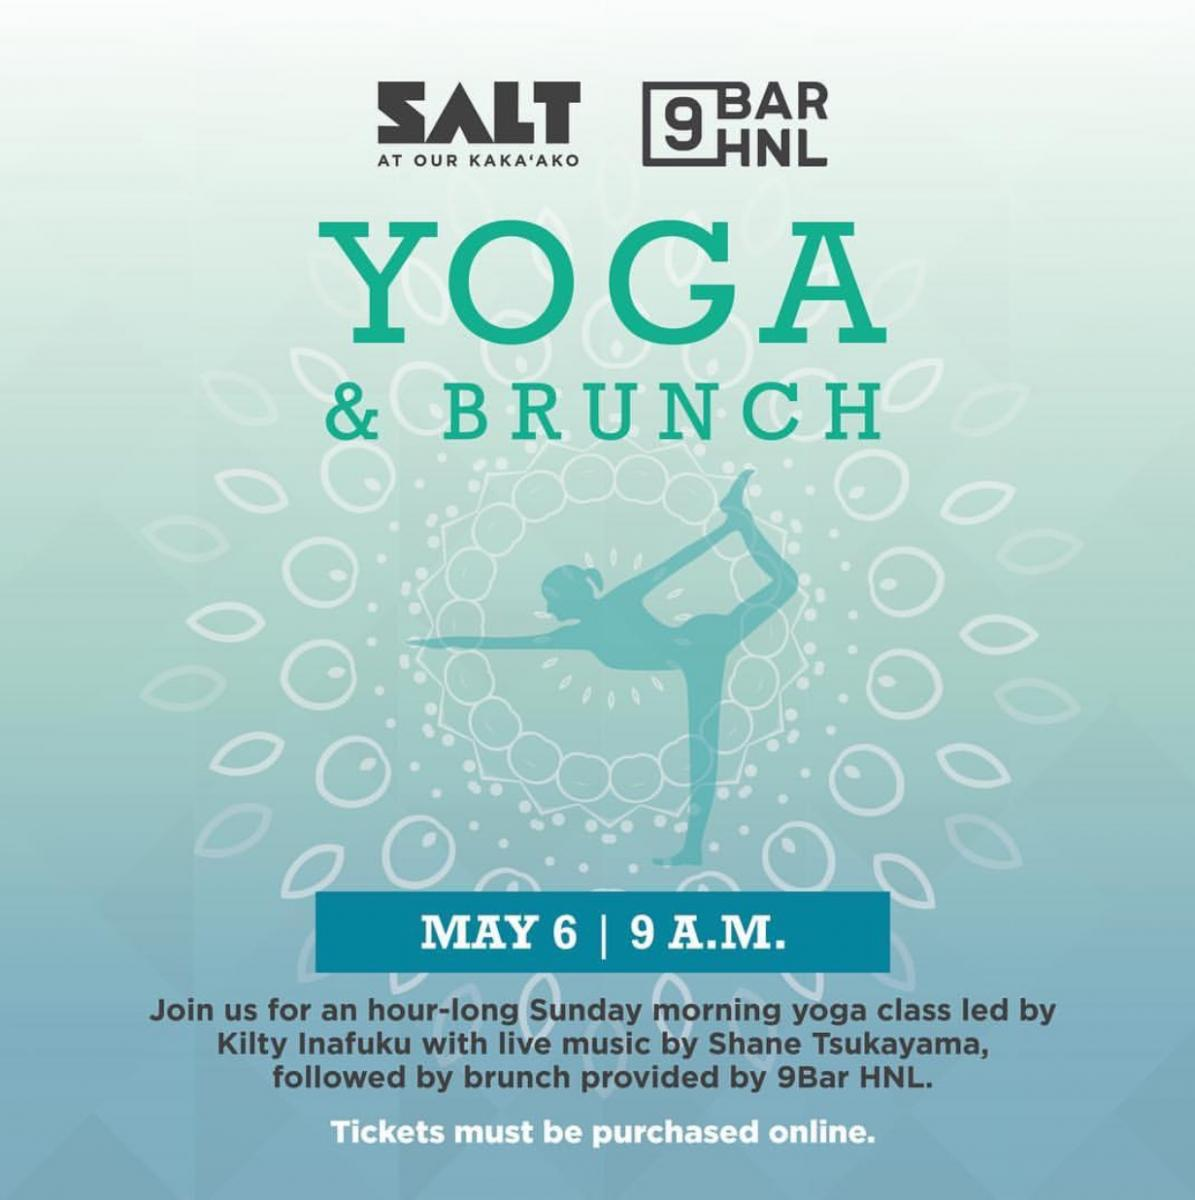 Yoga & Brunch at SALT at Our Kakaʻako